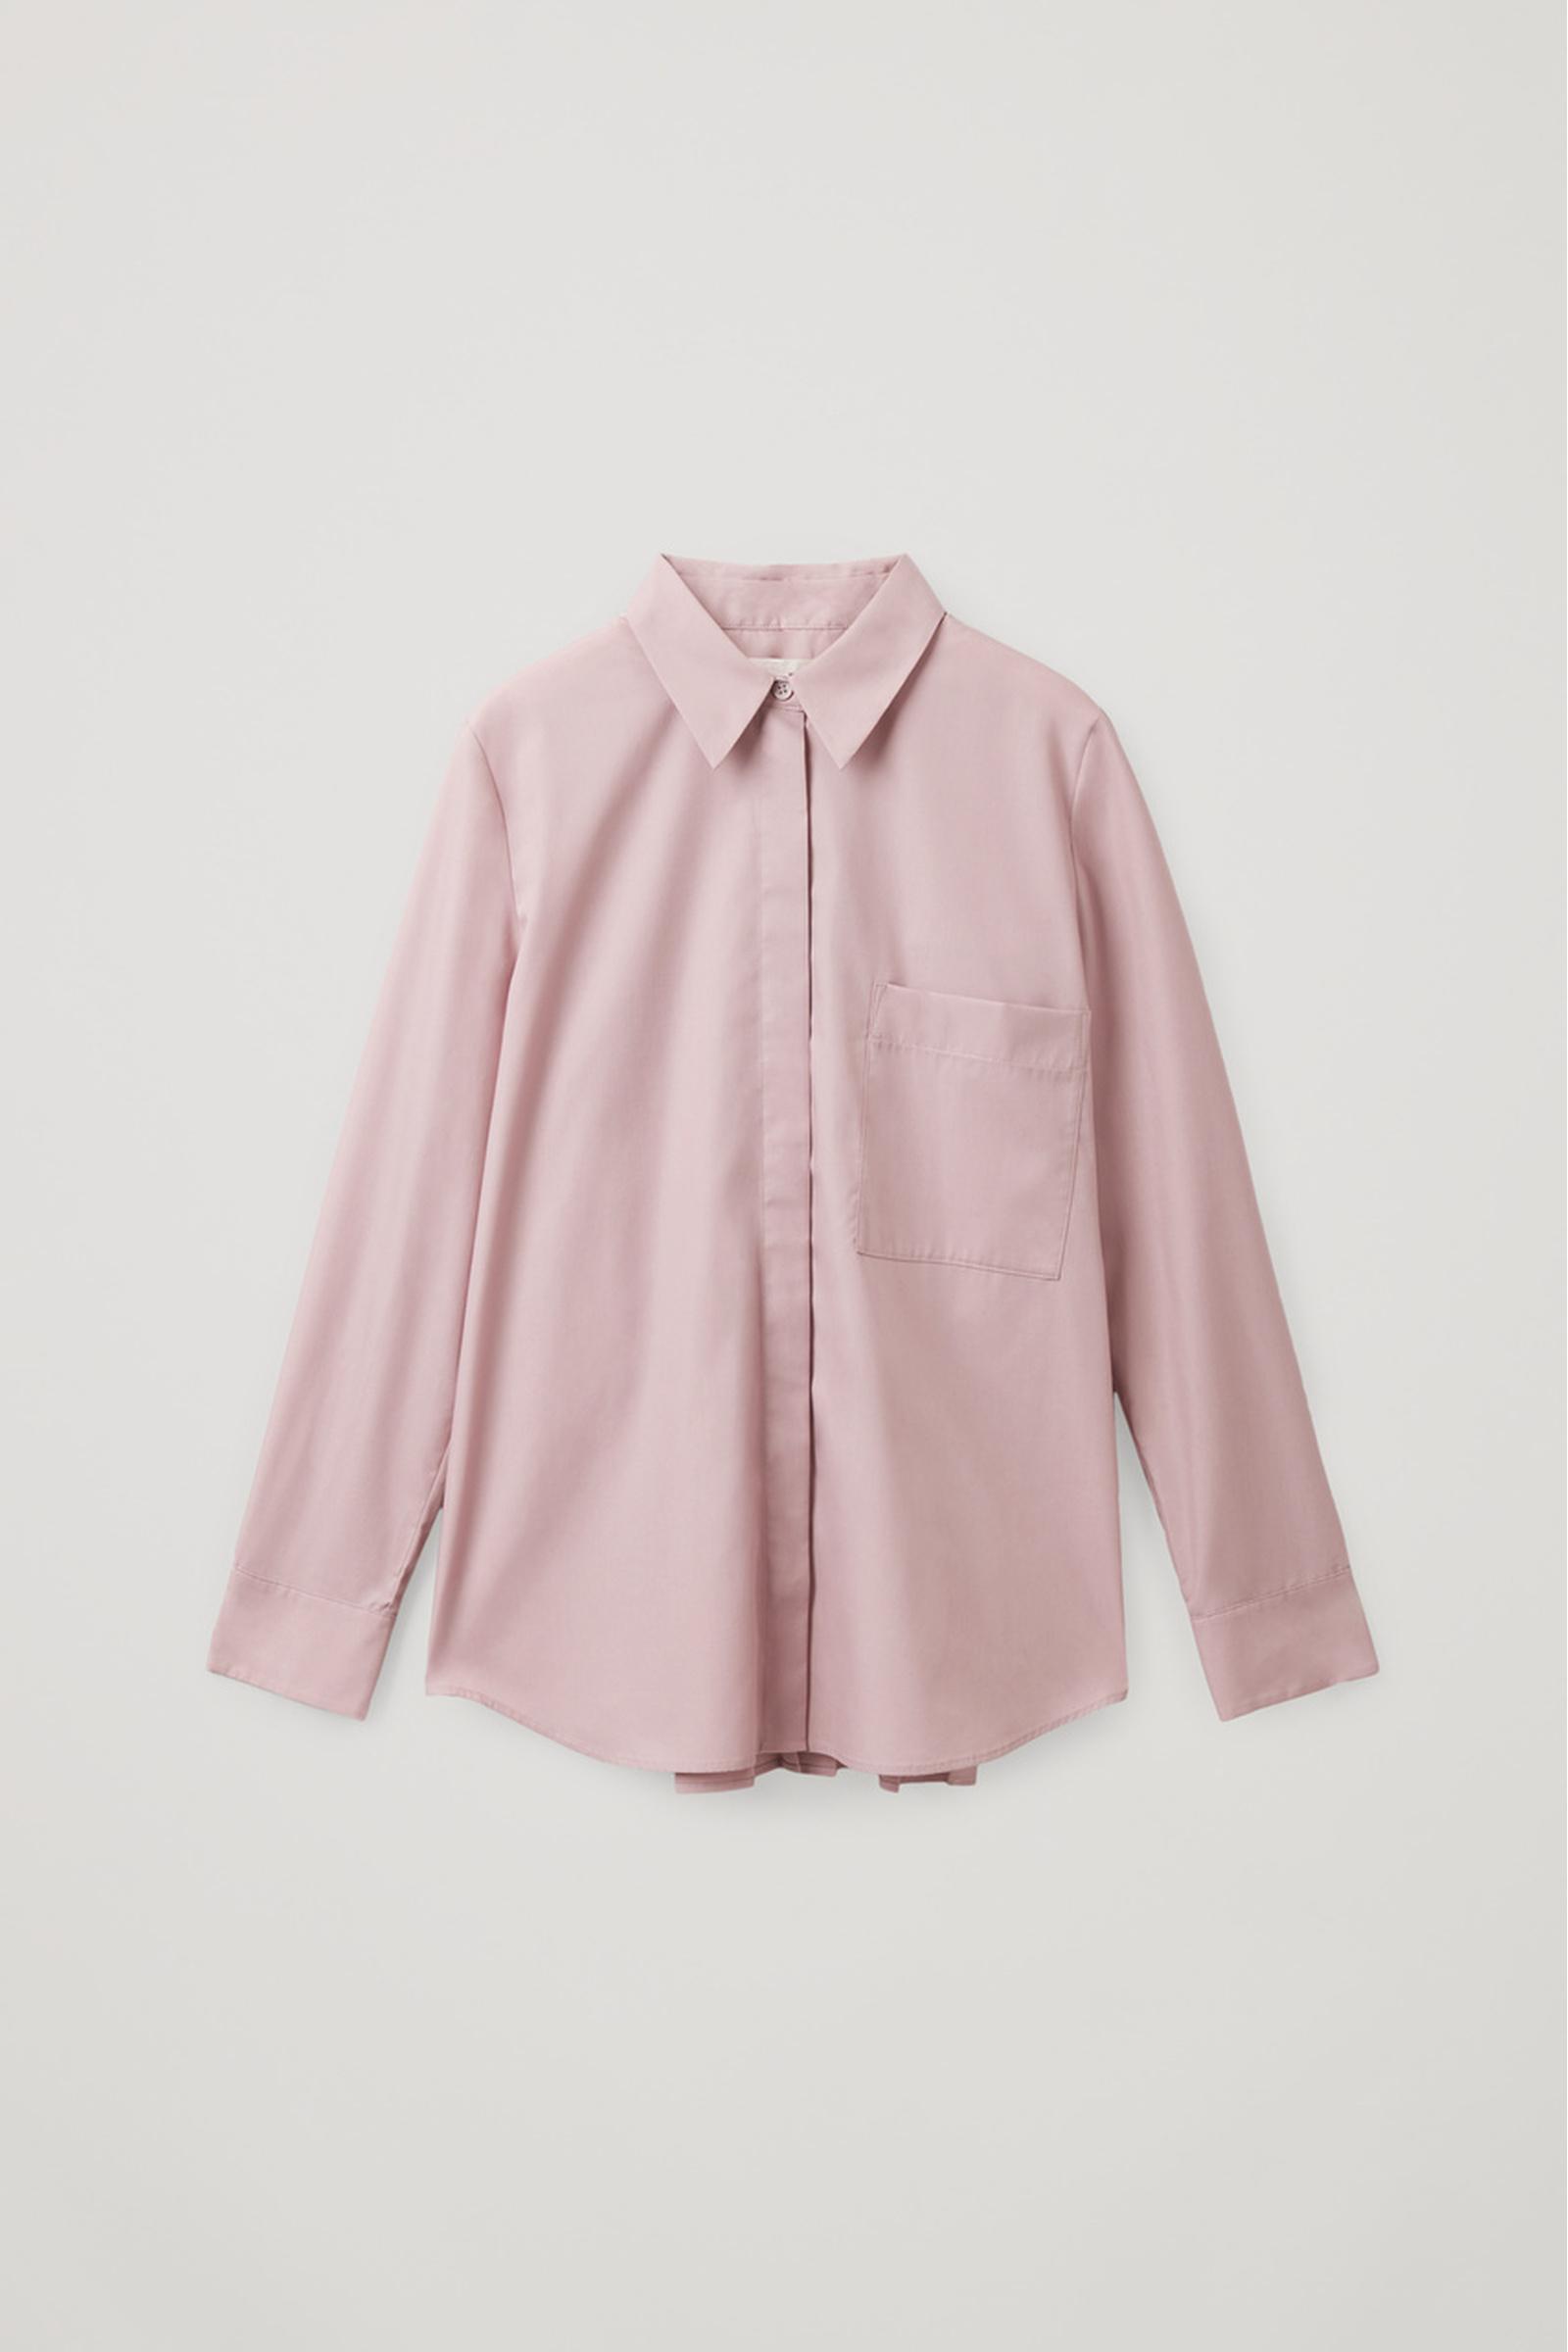 COS 오가닉 코튼 플리티드 튜닉 셔츠의 퍼플컬러 Product입니다.